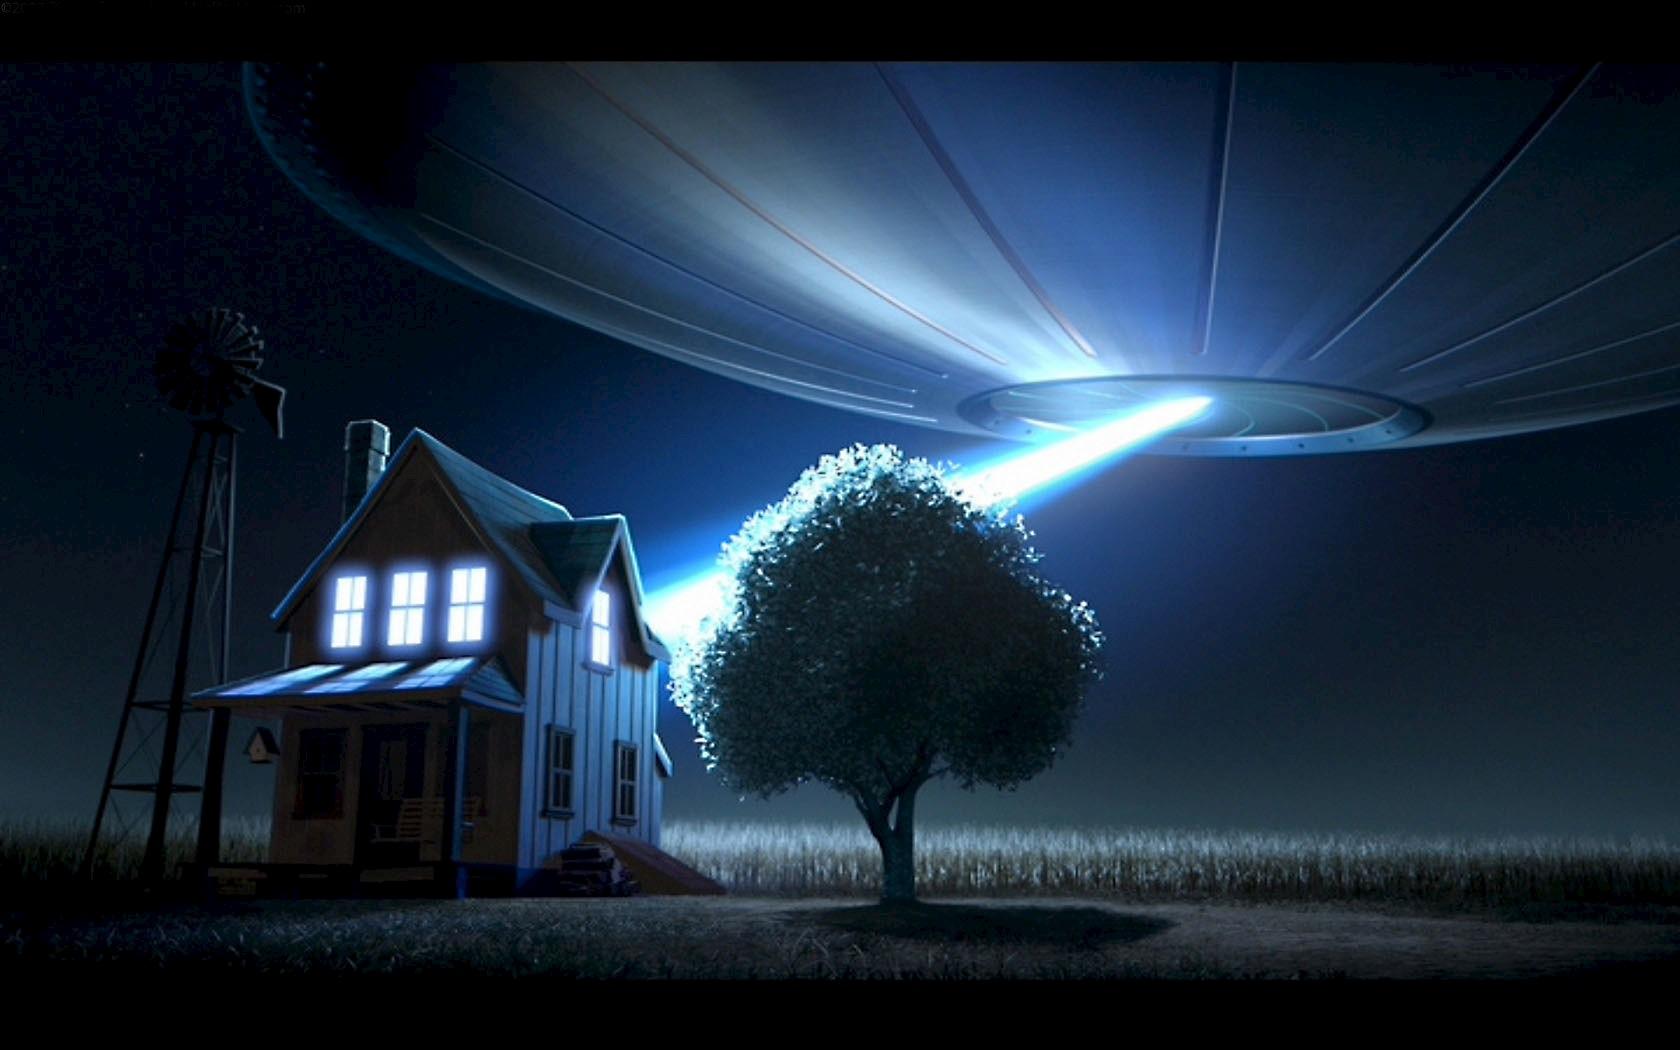 UFO by Paullus23 1680x1050